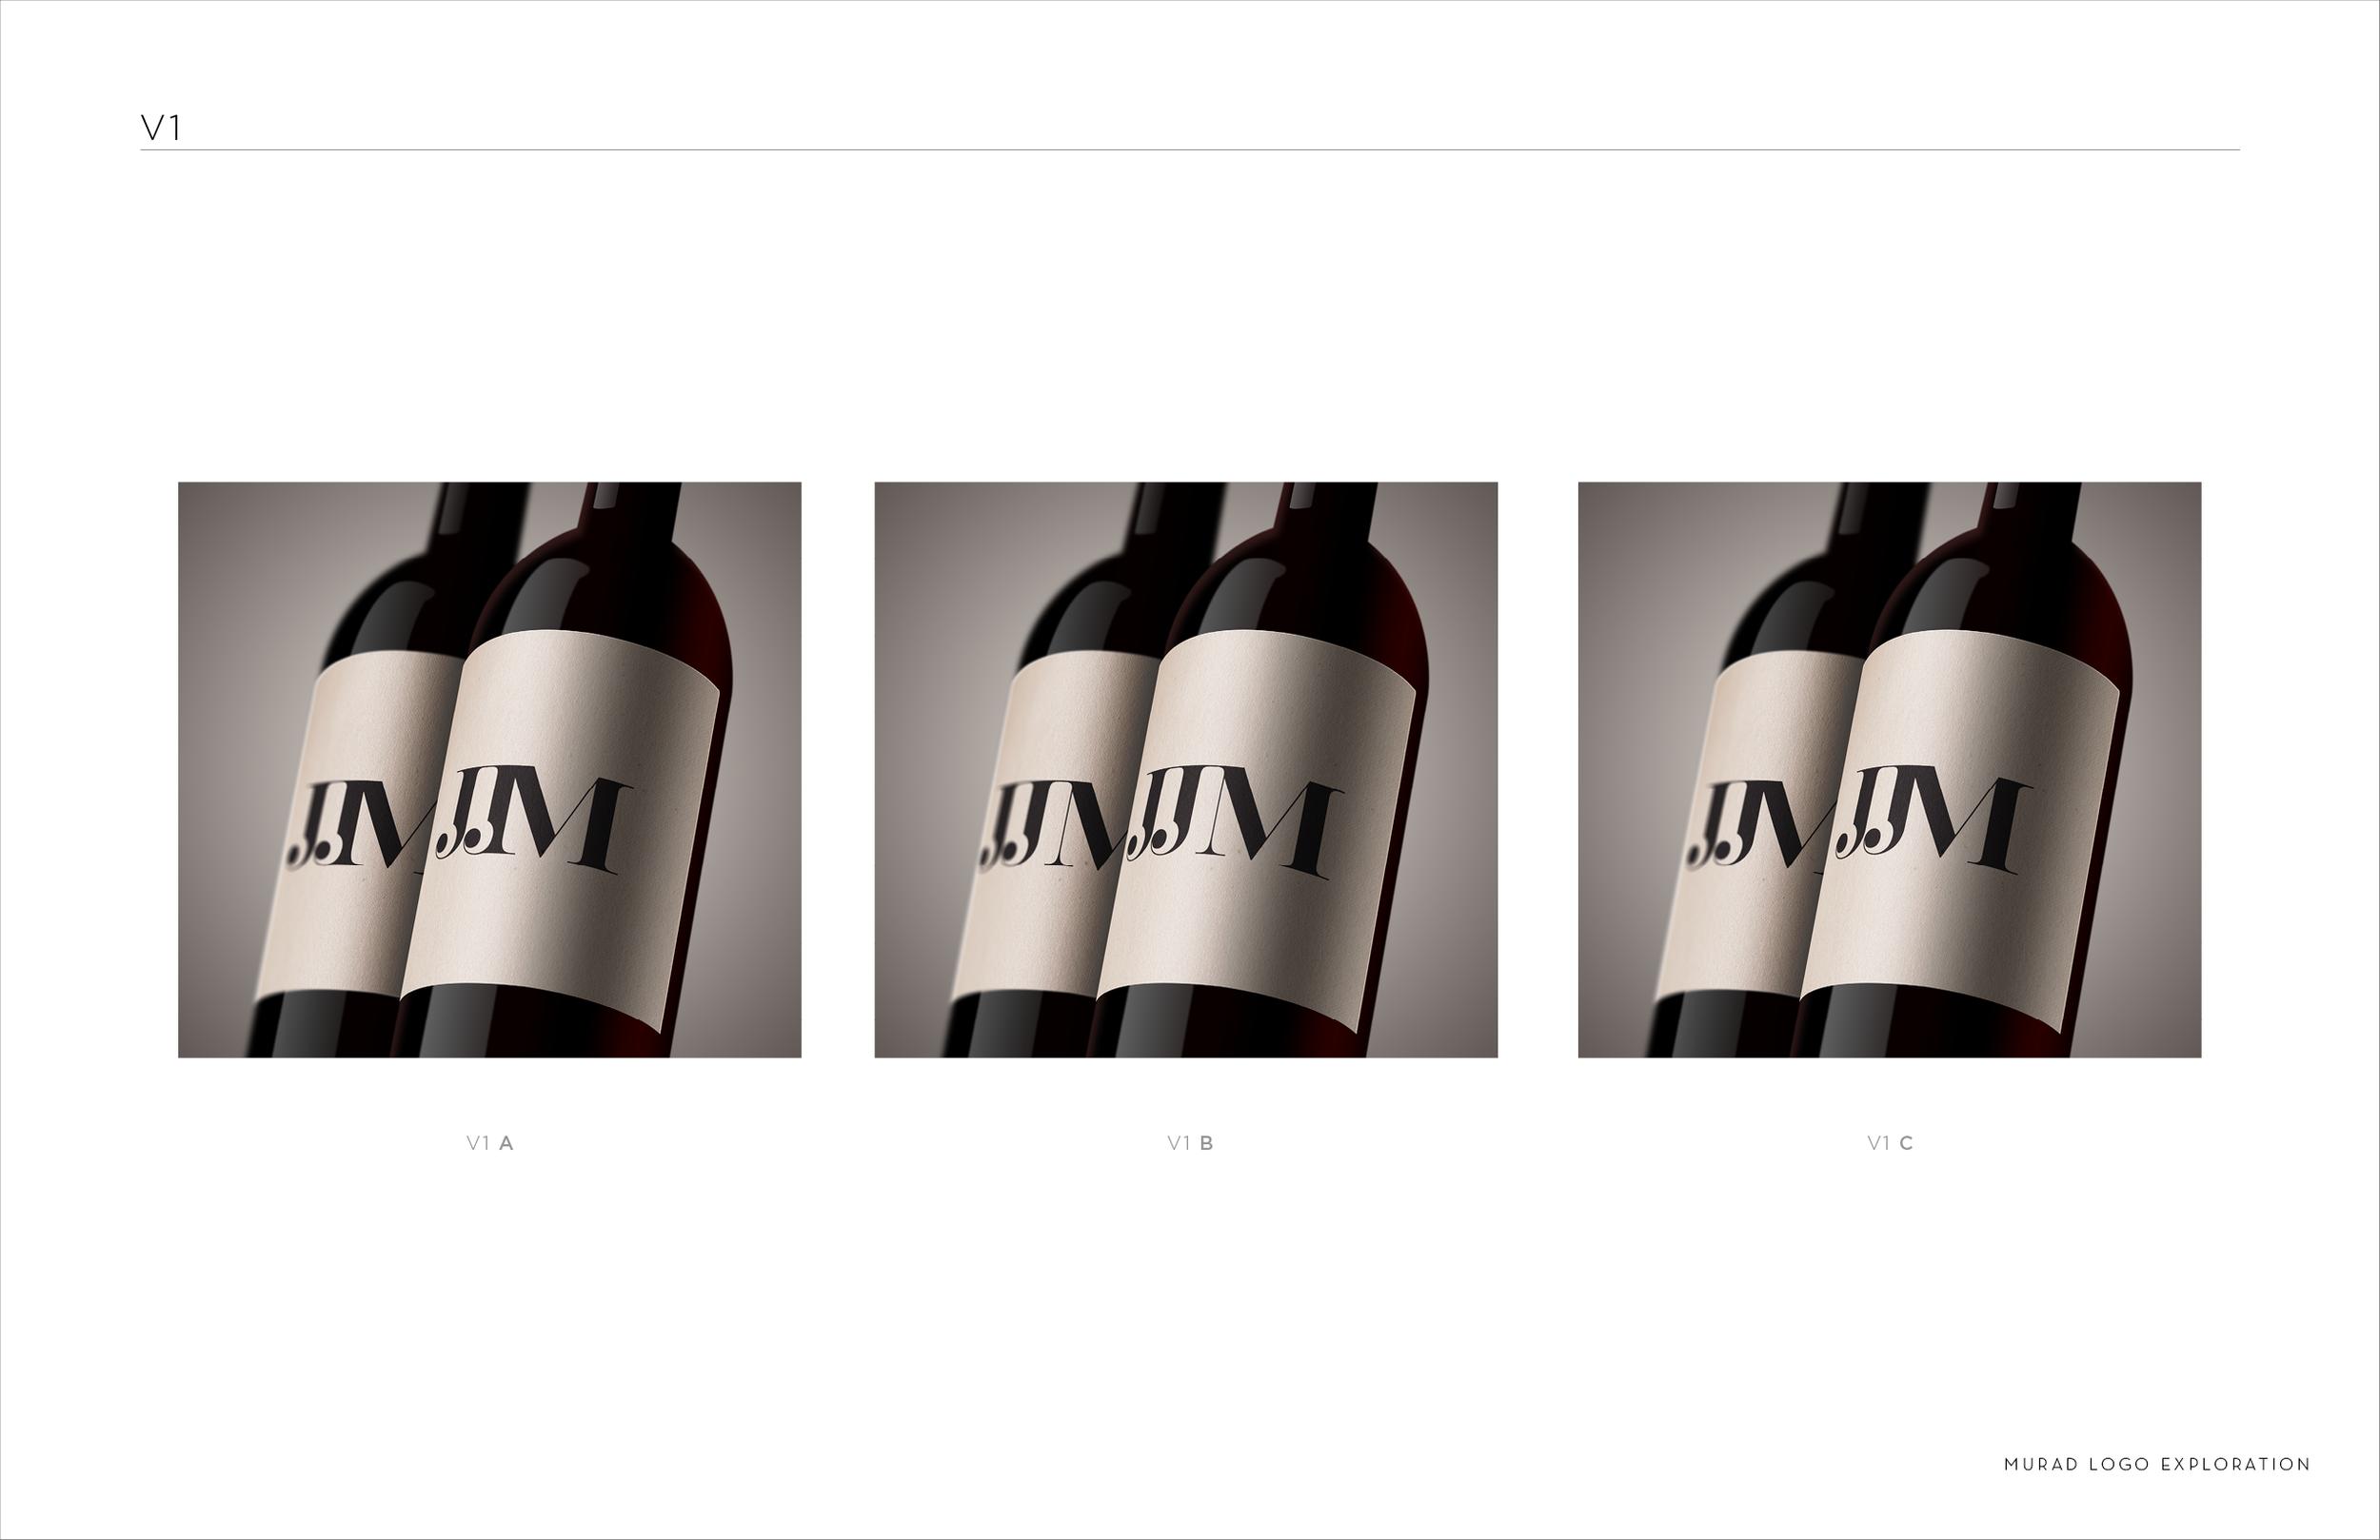 Miss-Vu_Murad_Wine_Logo_Exploration_3.png